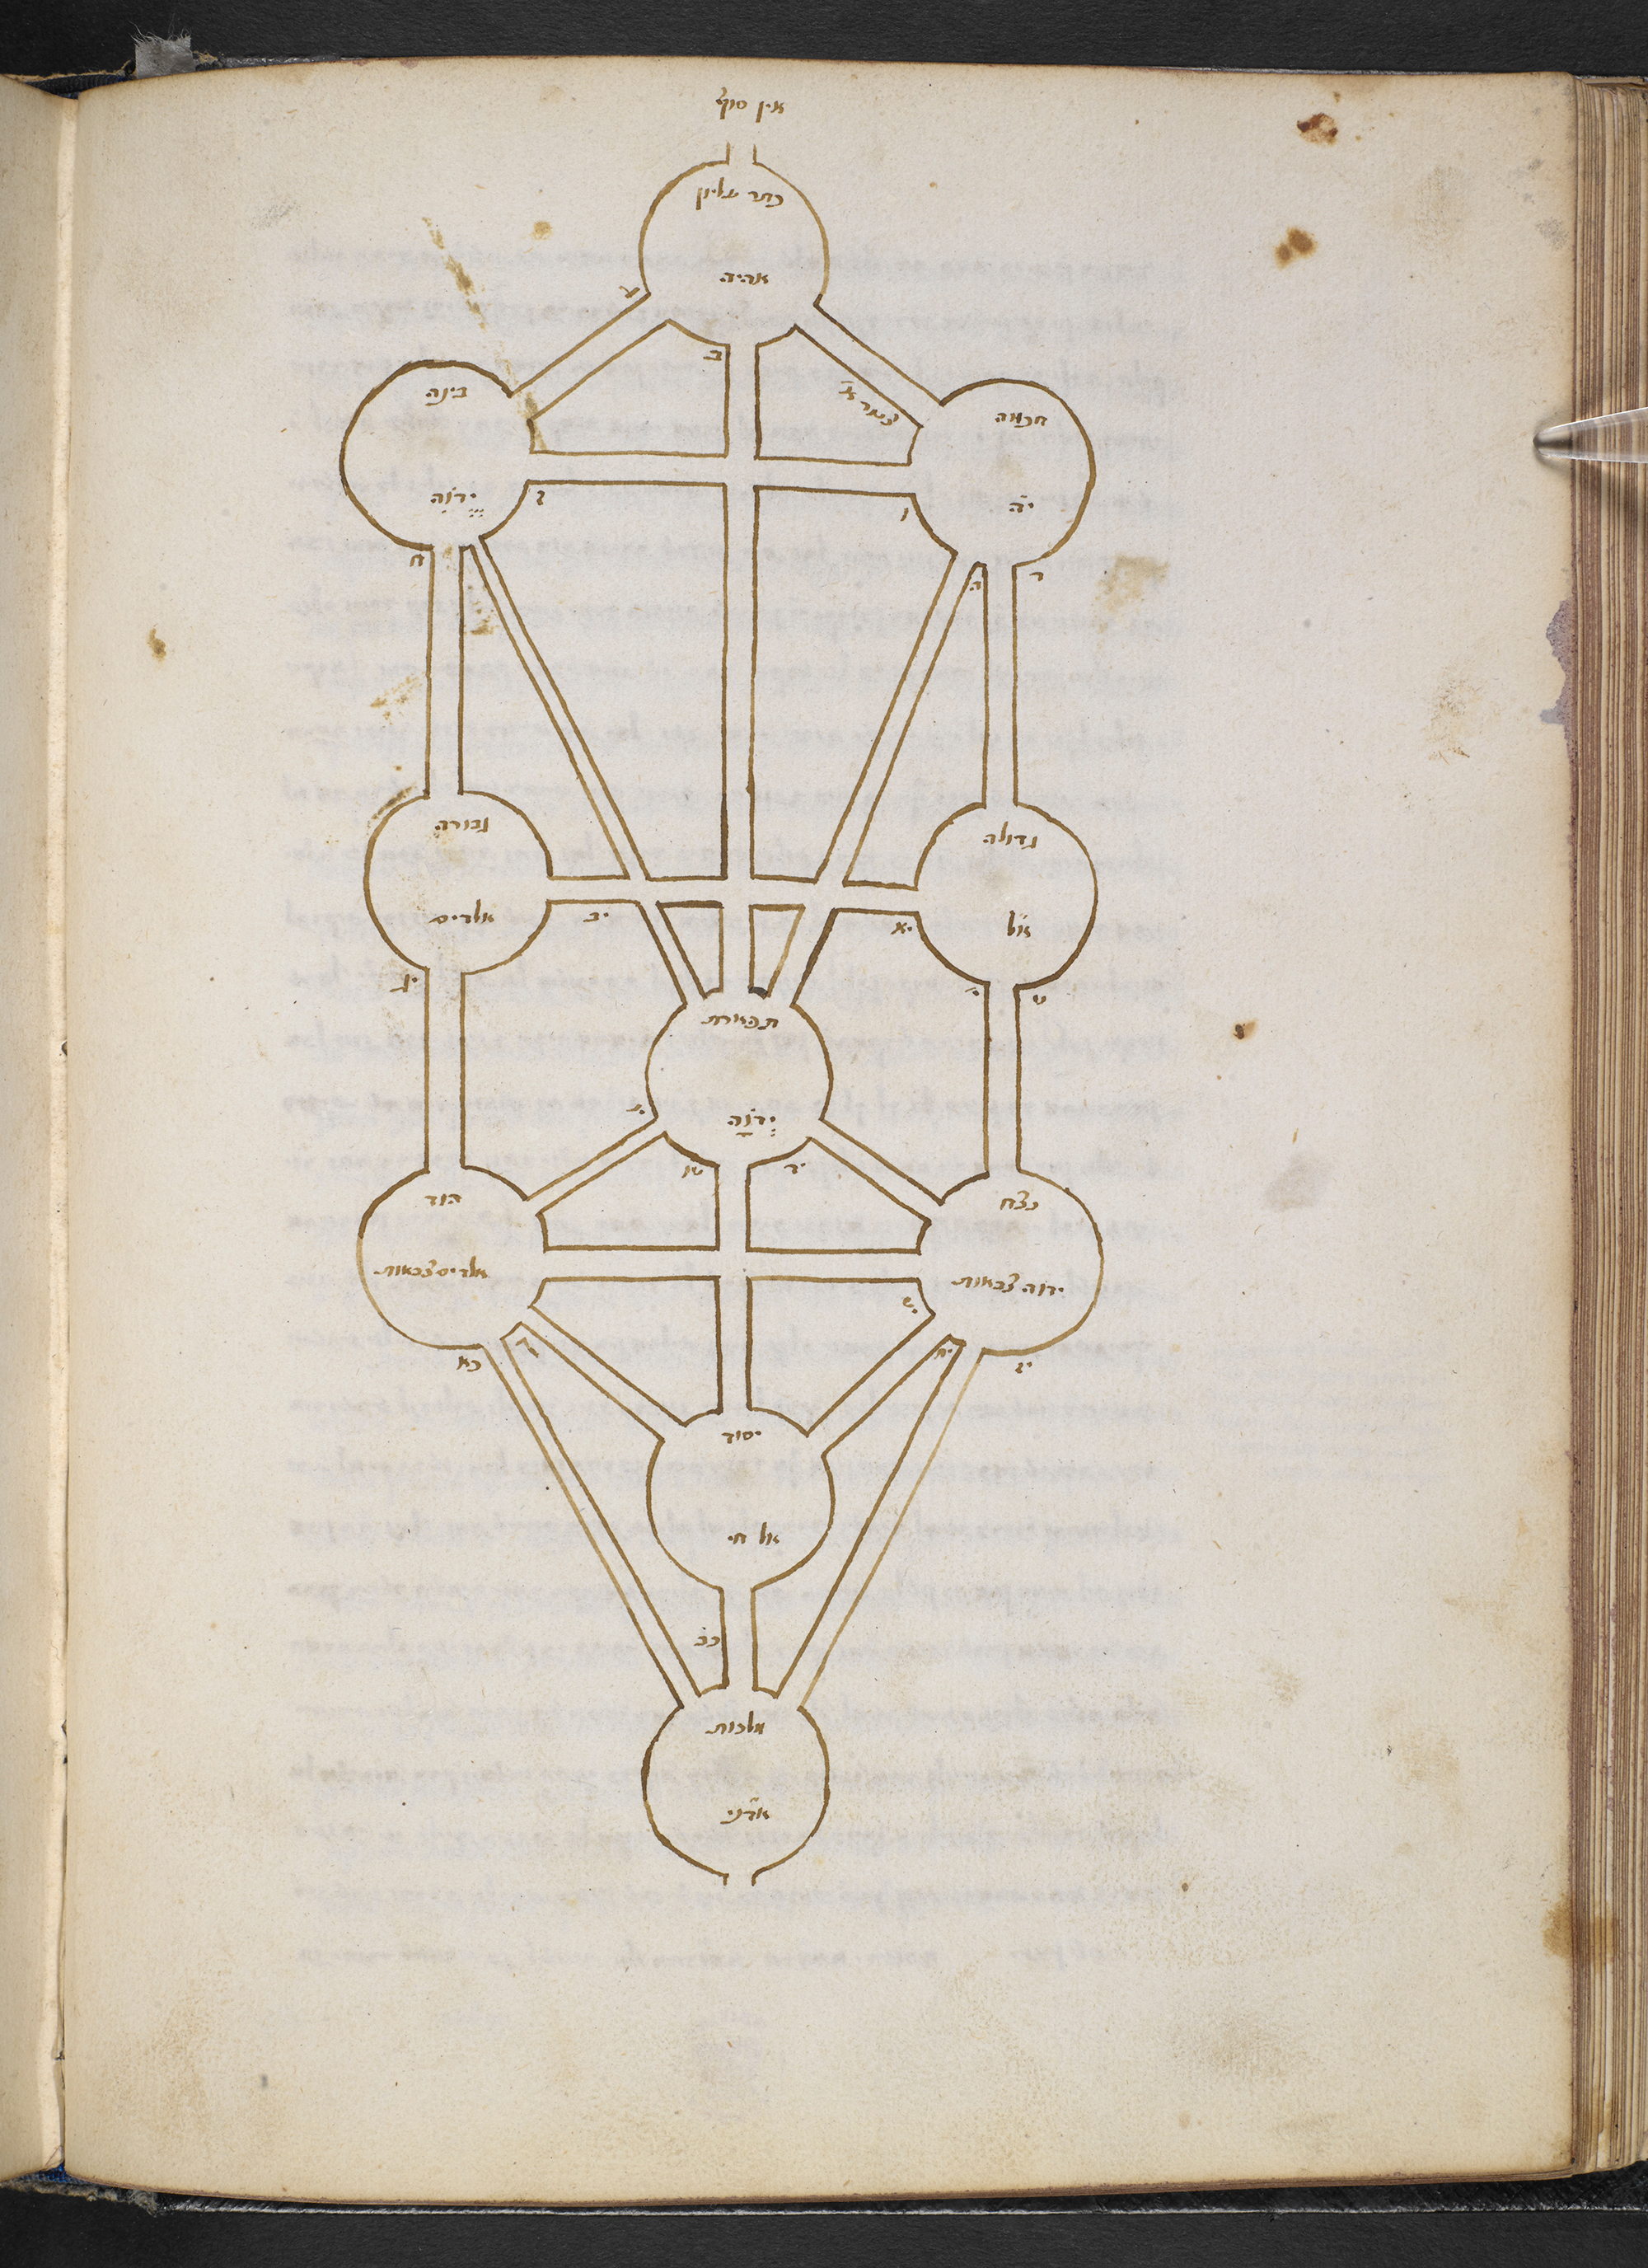 Abridgement of Law Cases  Edward I   Henry VI   Rouen  Guillaume Le Talleur for Richard Pynson   c        not after        The SaleRoom com